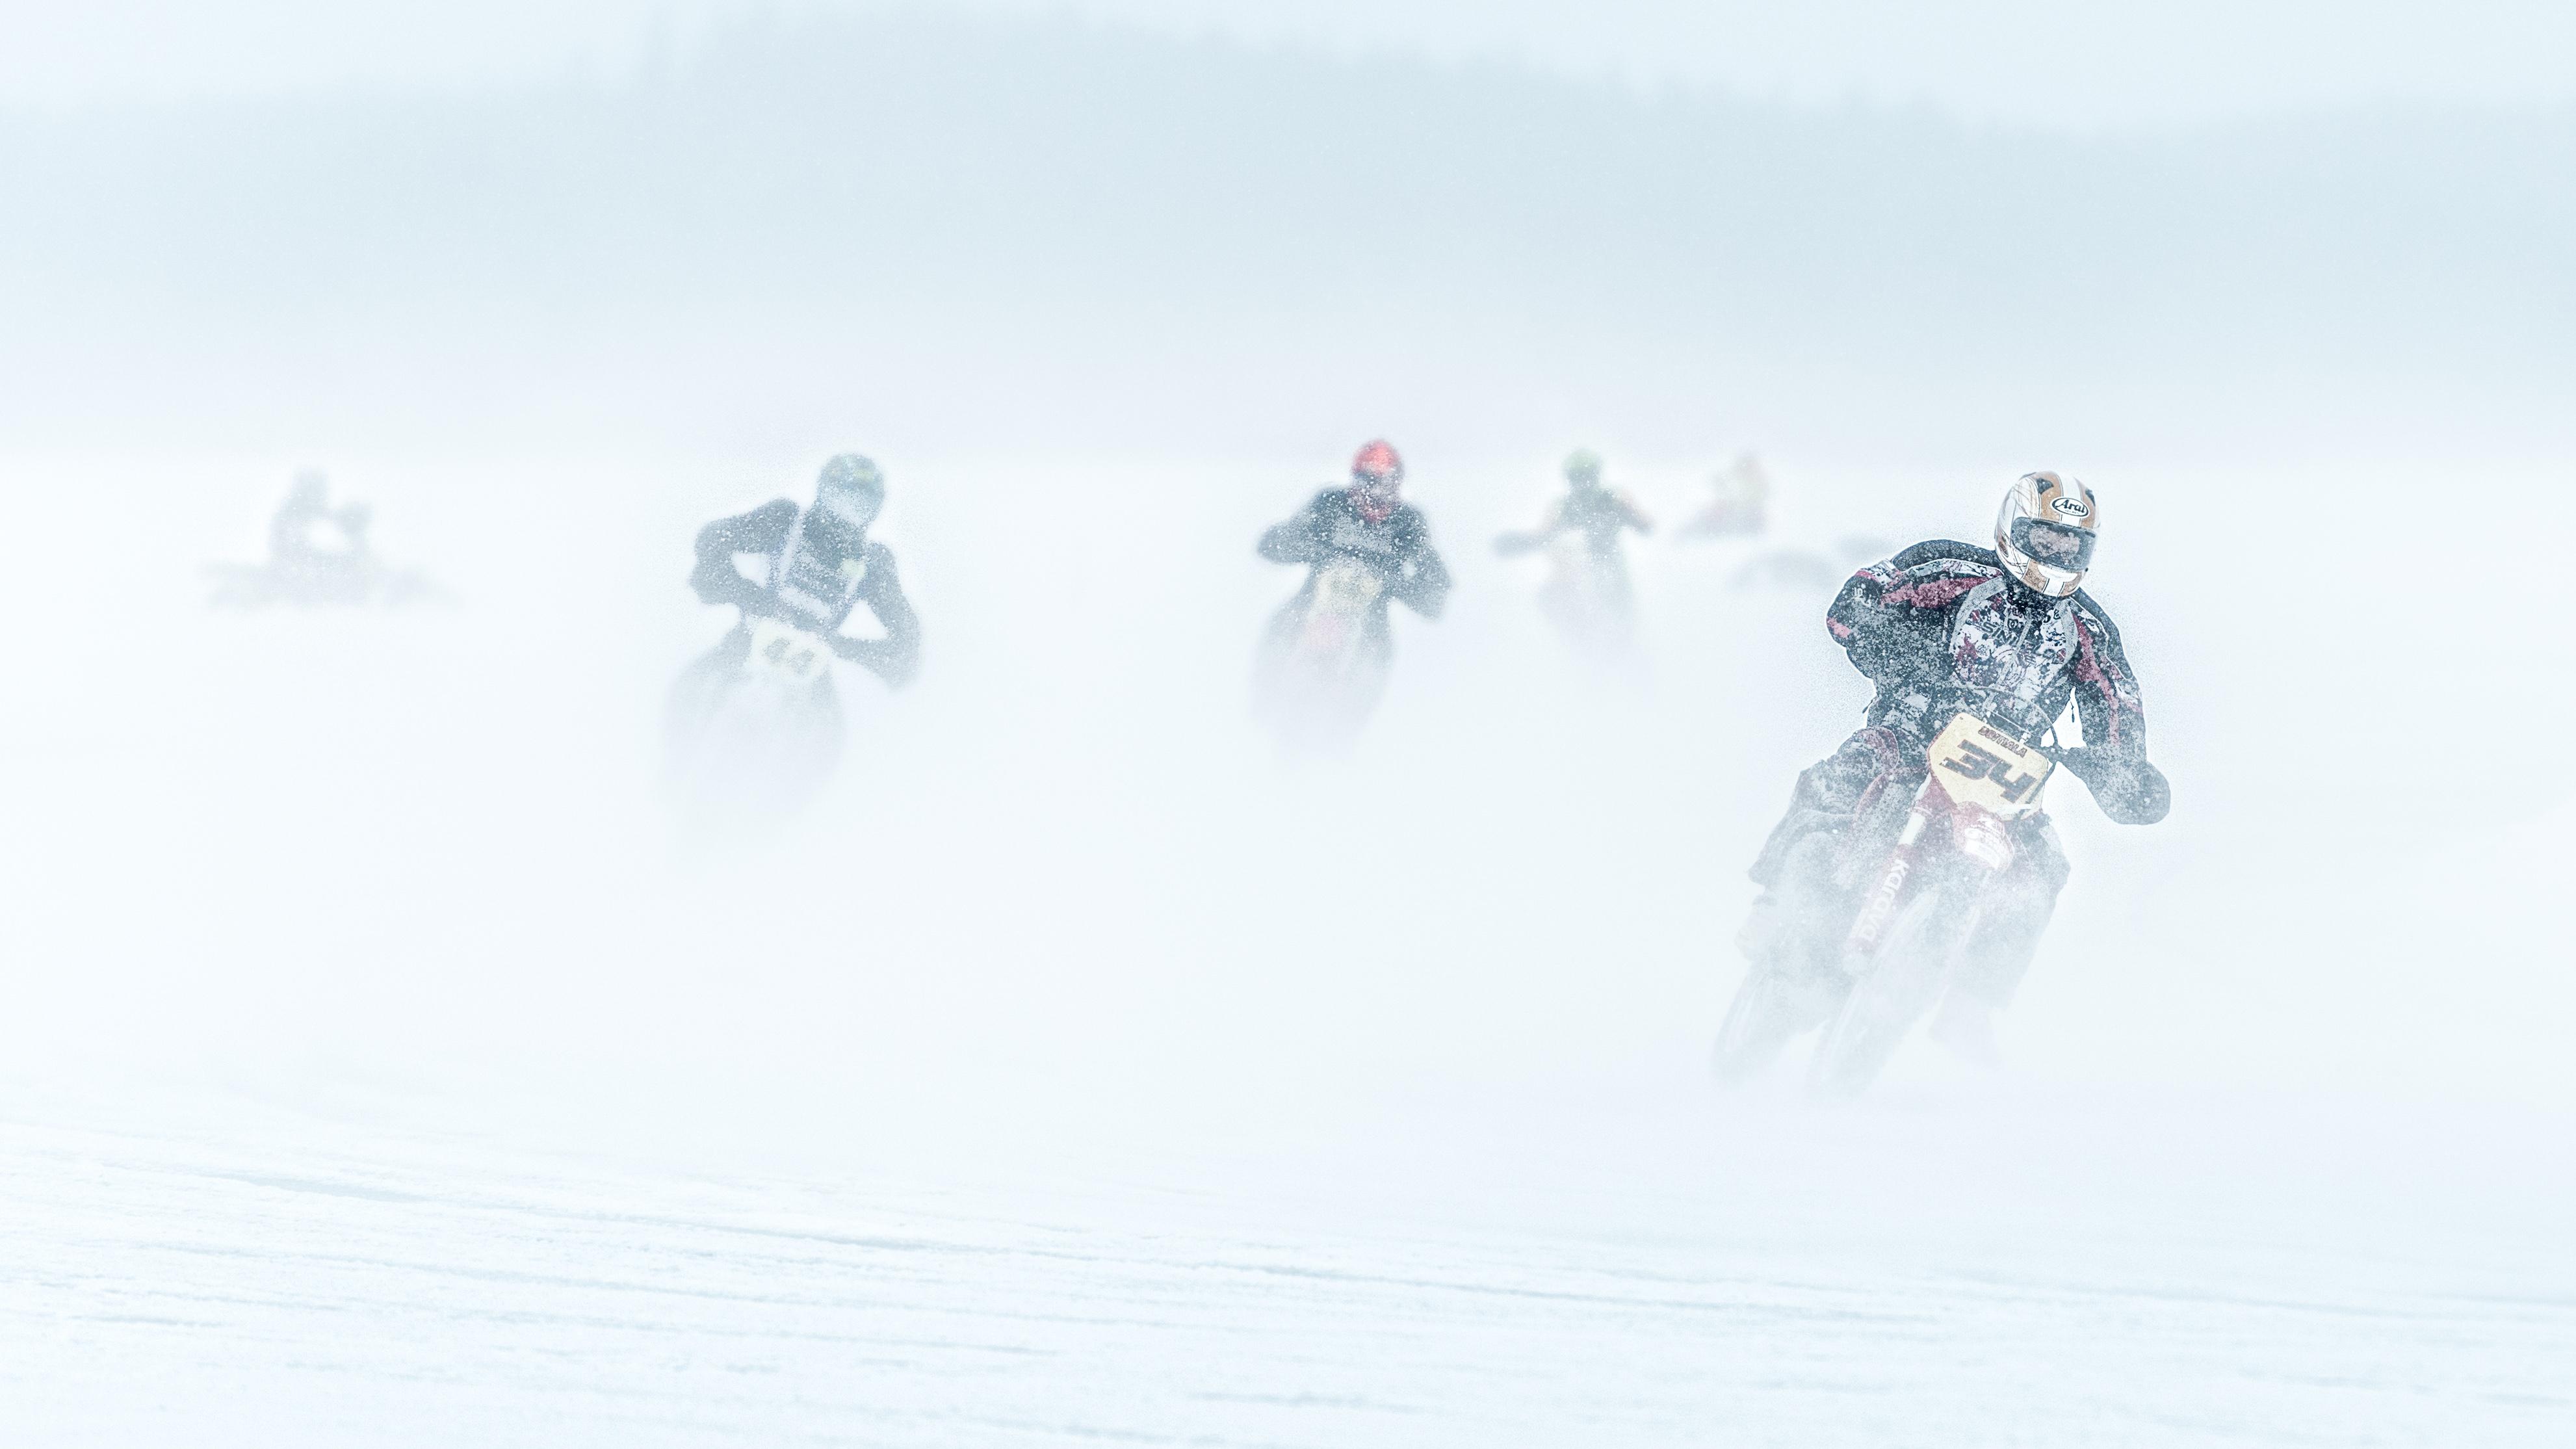 Motocross: Snow, Winter, Motorcycle, Race, Motocross